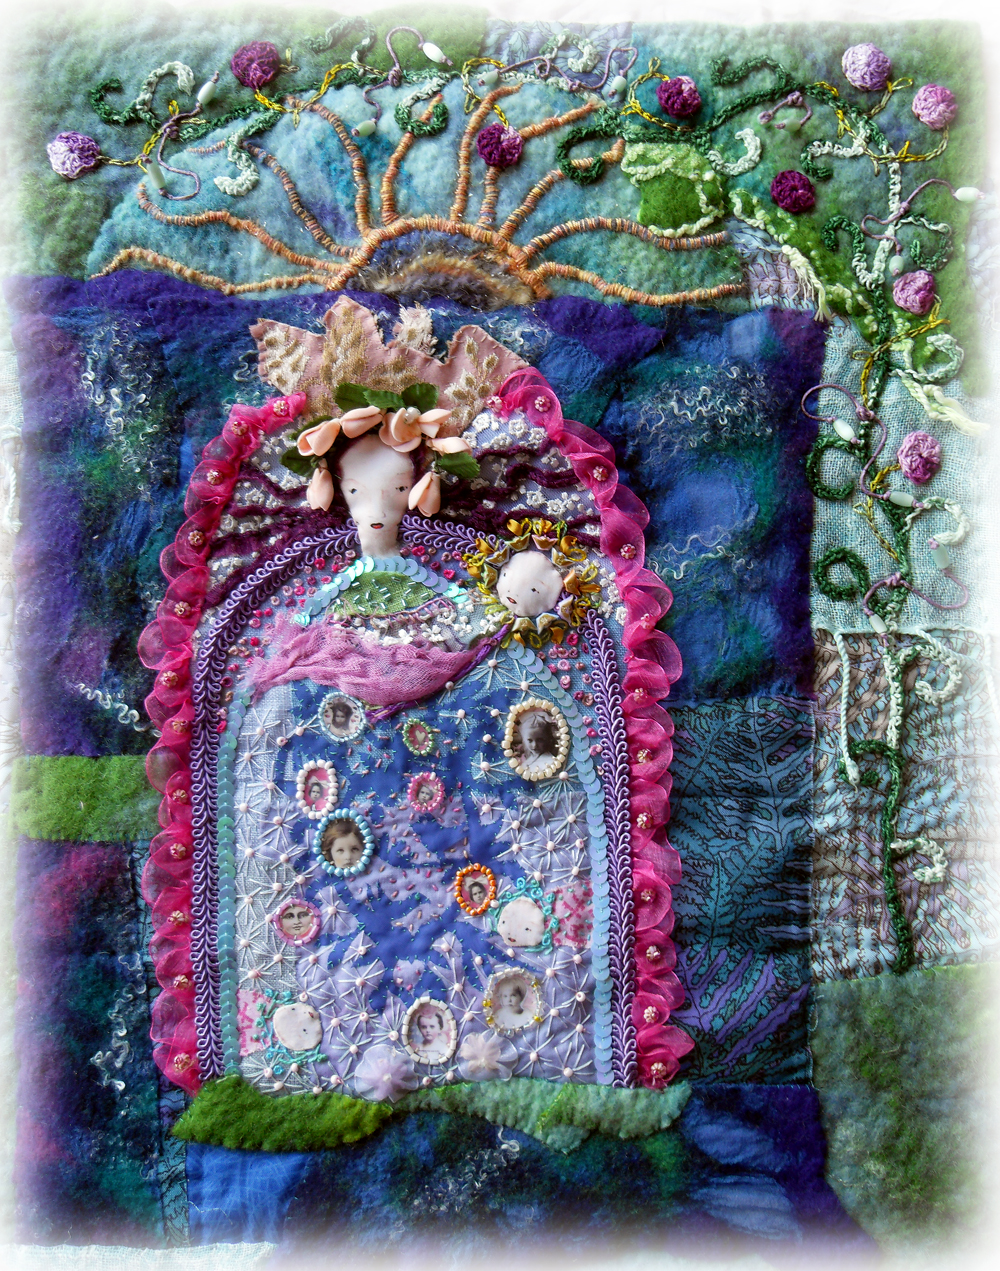 THE FABRIC OF MEDITATION - SARA LECHNER\'S BLOG: 2010